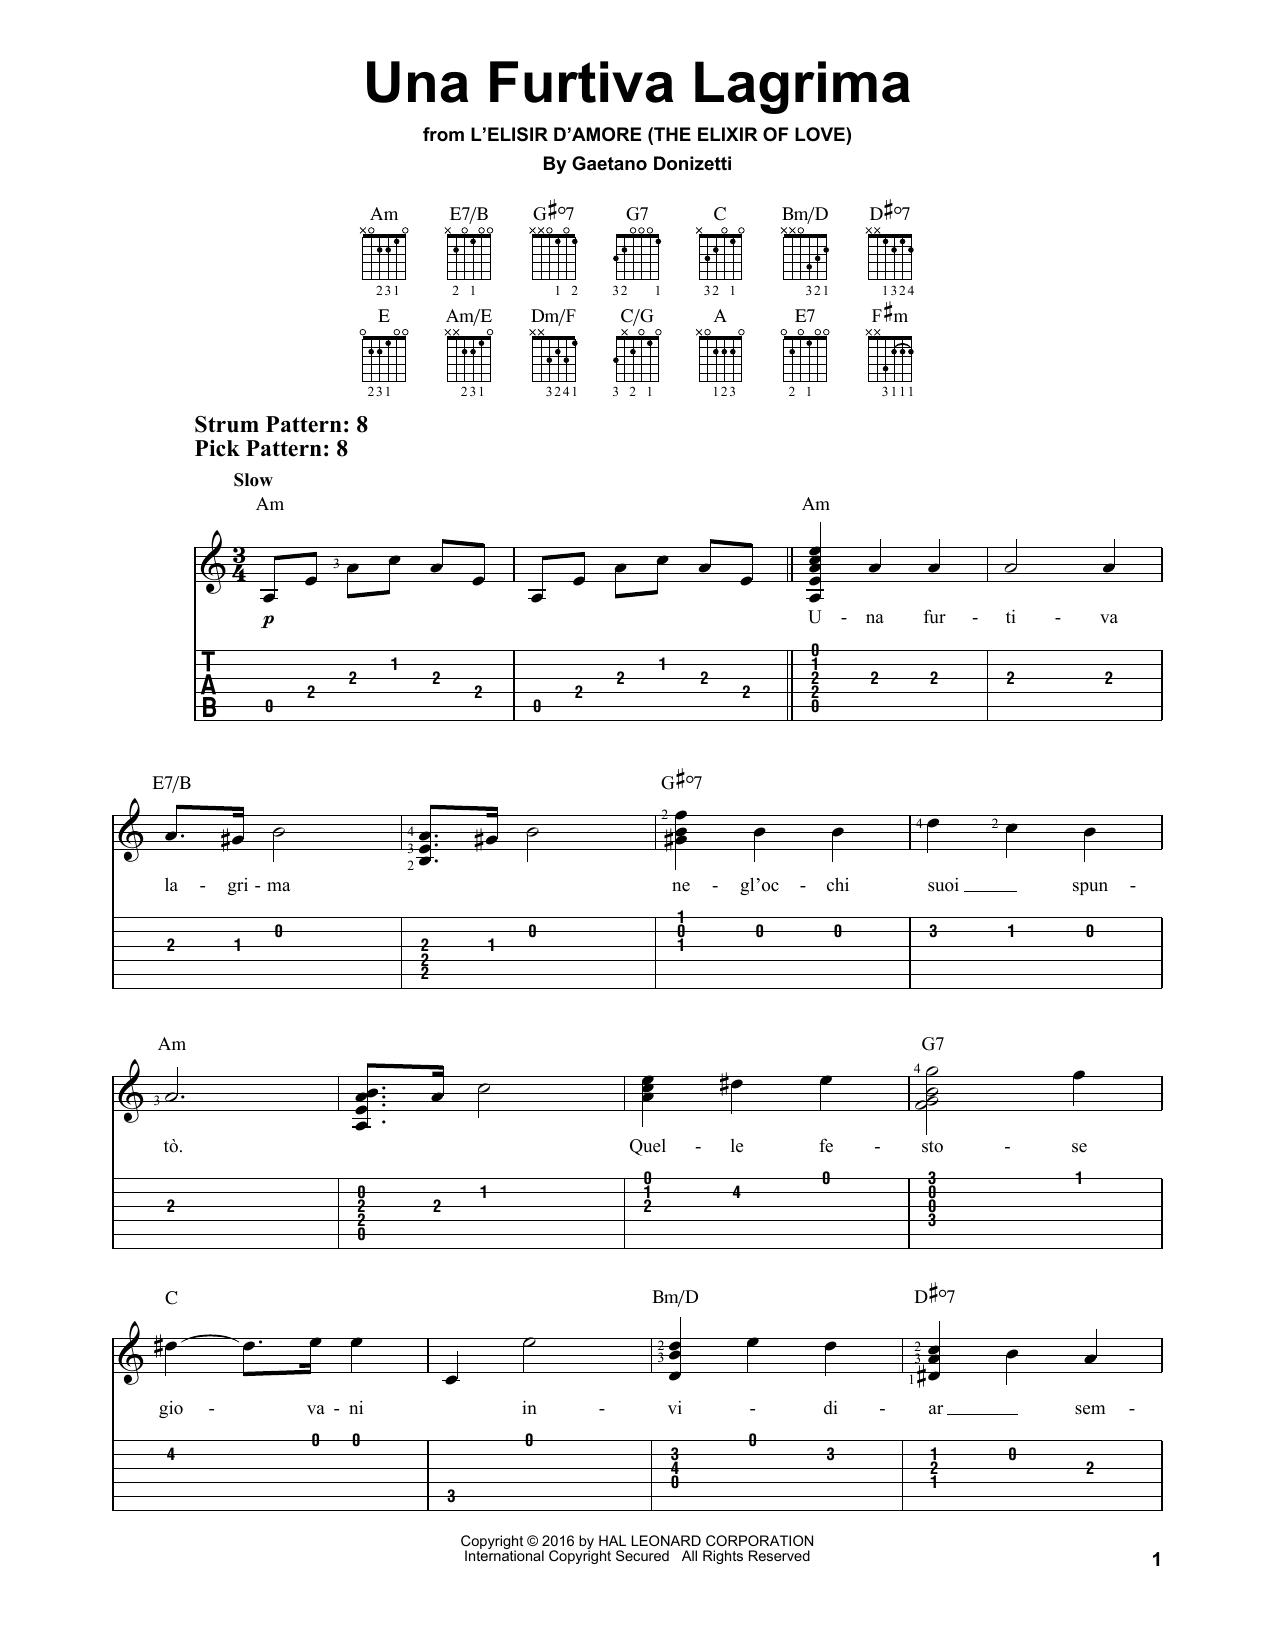 Gaetano Donizetti Una Furtiva Lagrima sheet music notes and chords. Download Printable PDF.